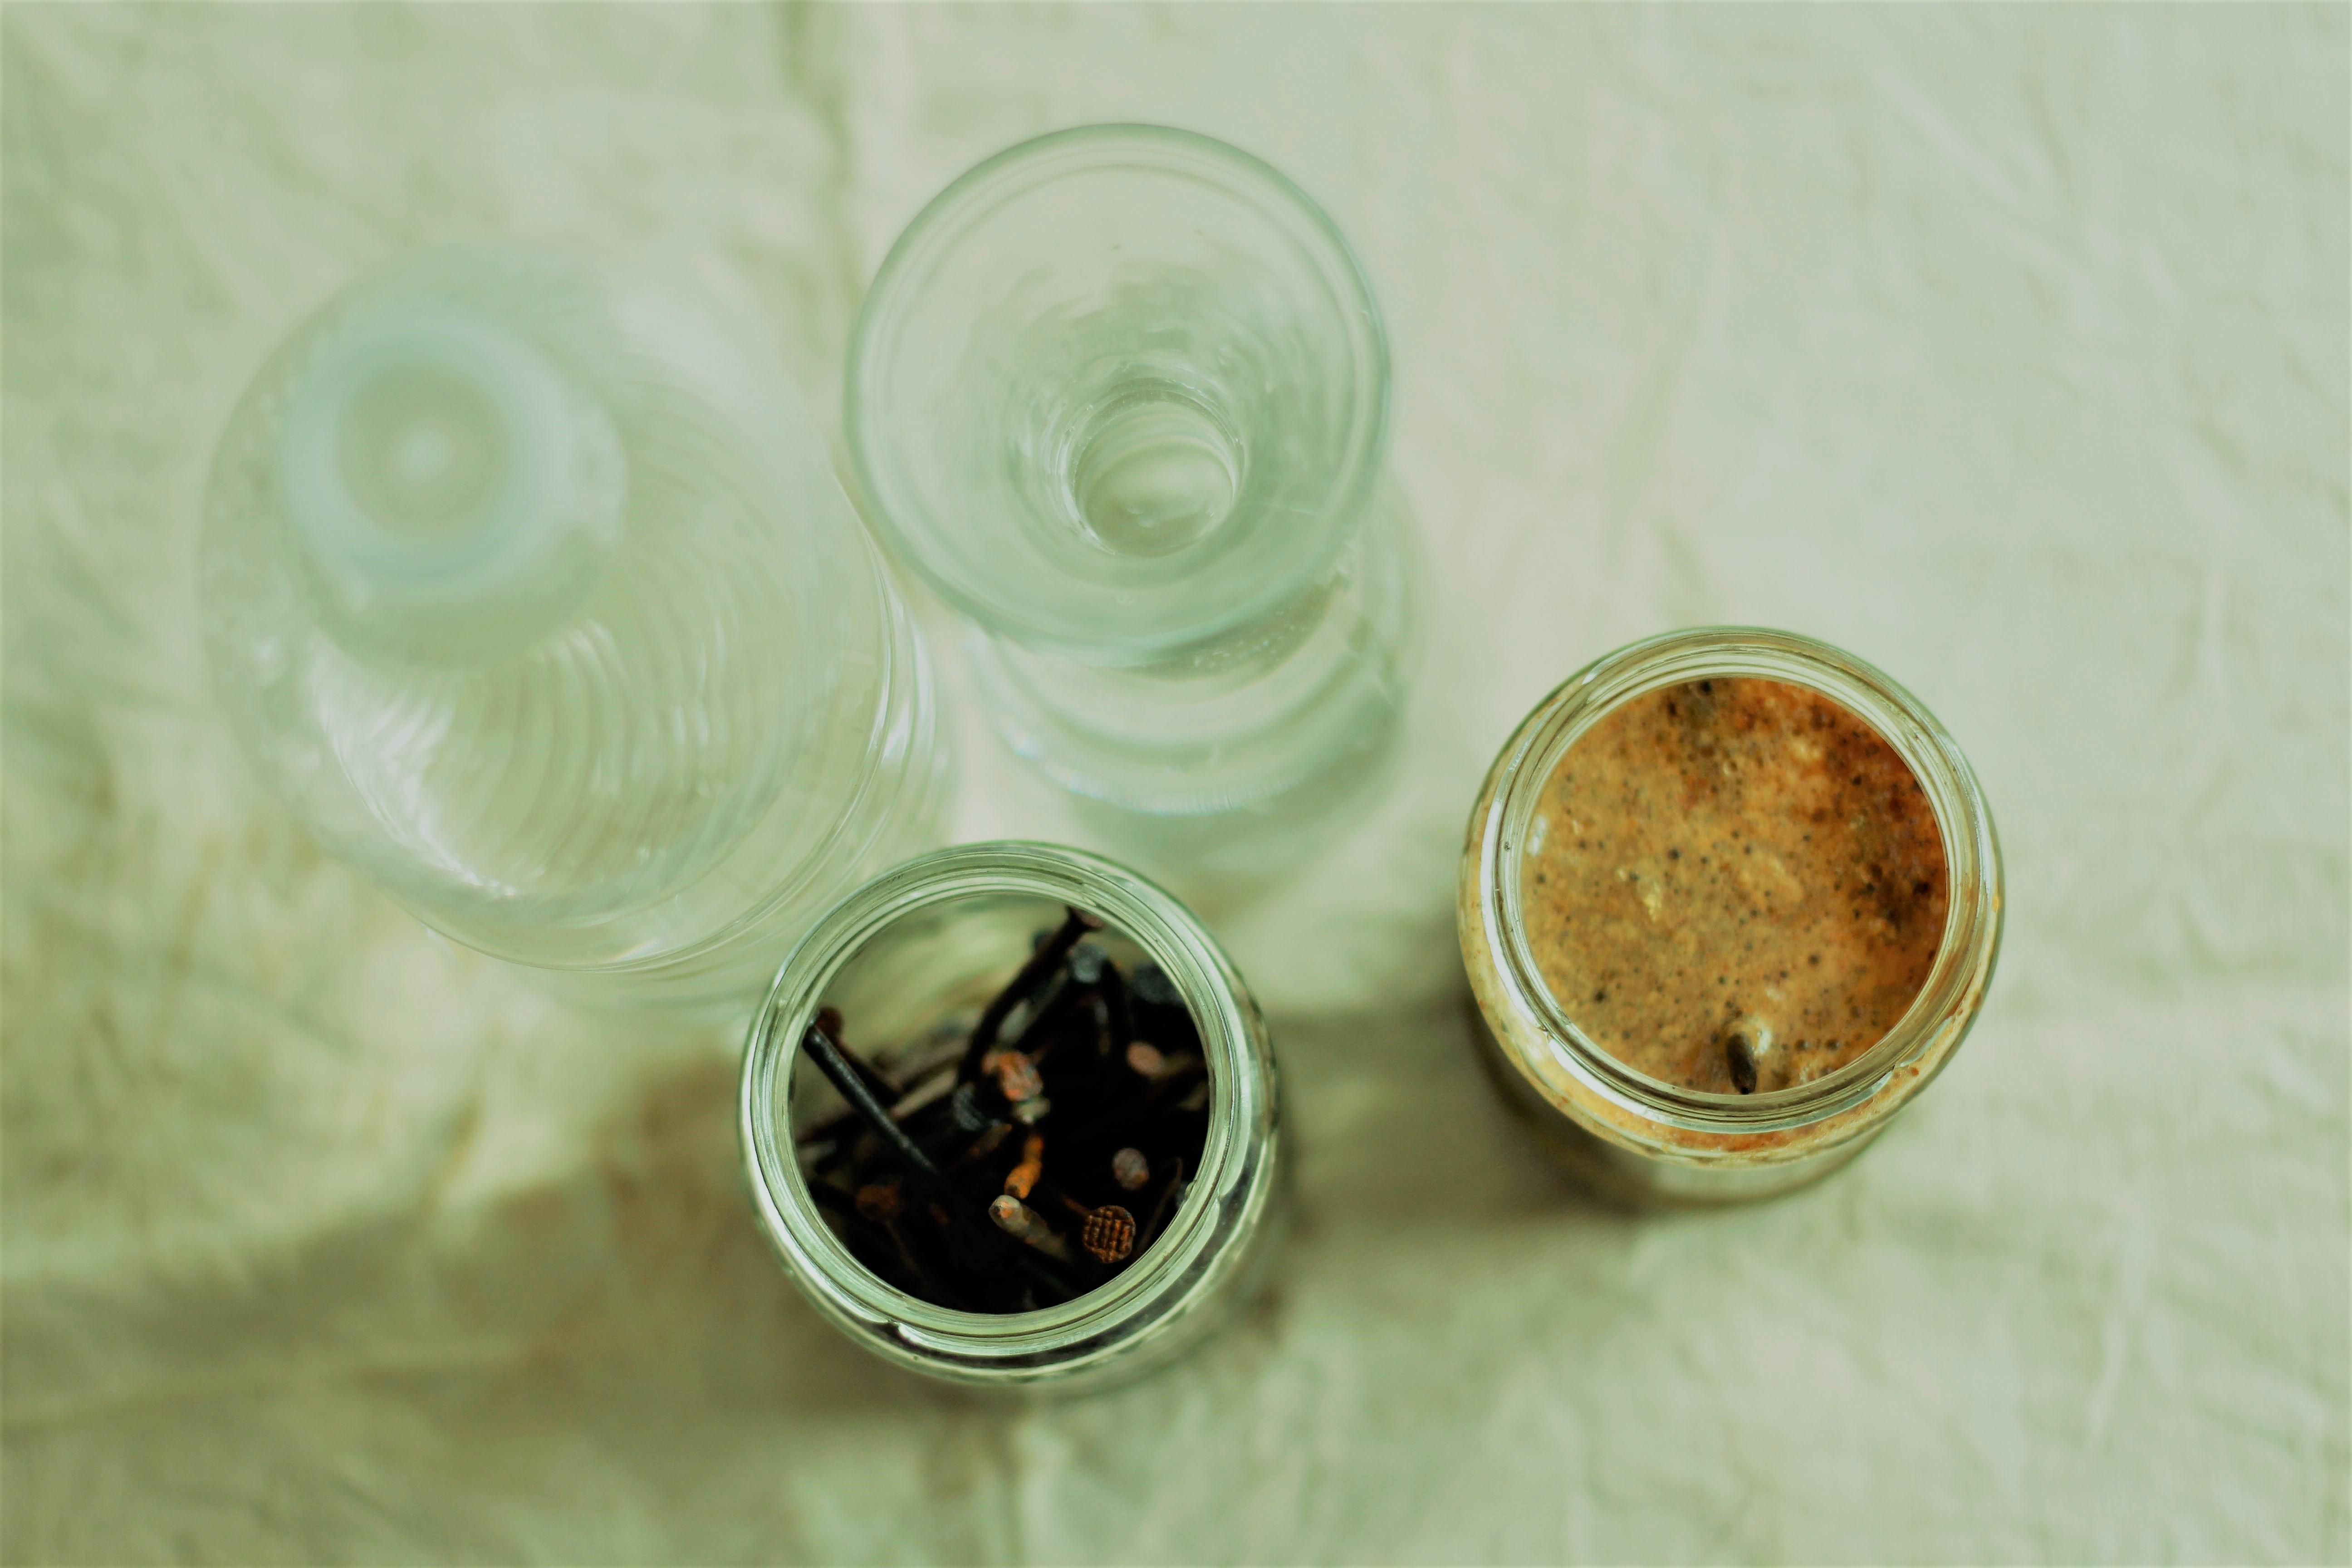 claudialeclercq-dusoleildanslenord-naturaldyeing-tintesnaturales-ironwater-solalnorte-5 (2)